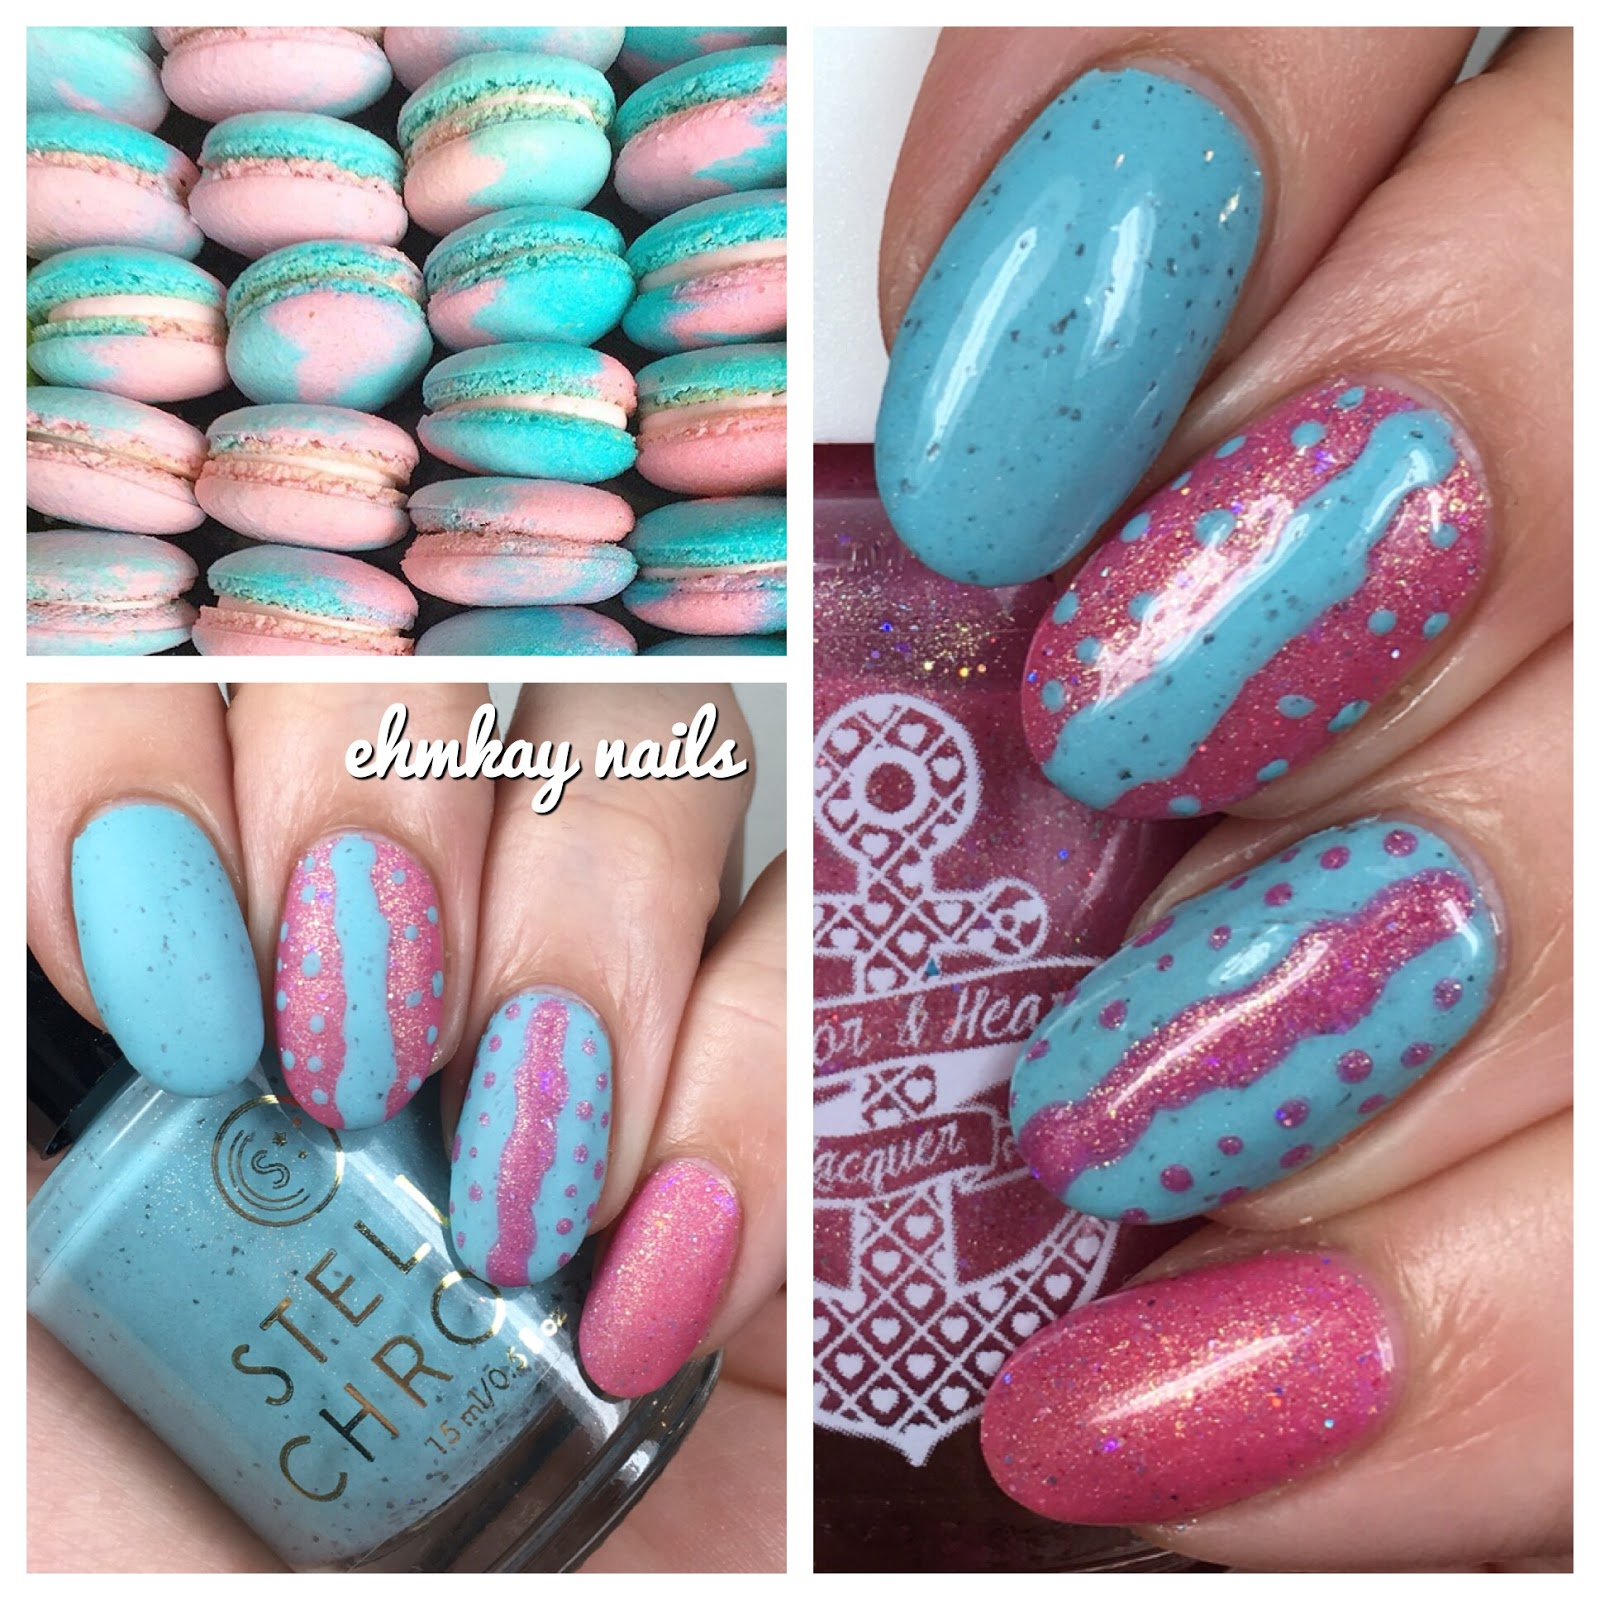 Ehmkay Nails Macaron Nail Art With Anchor Heart And Stella Chroma